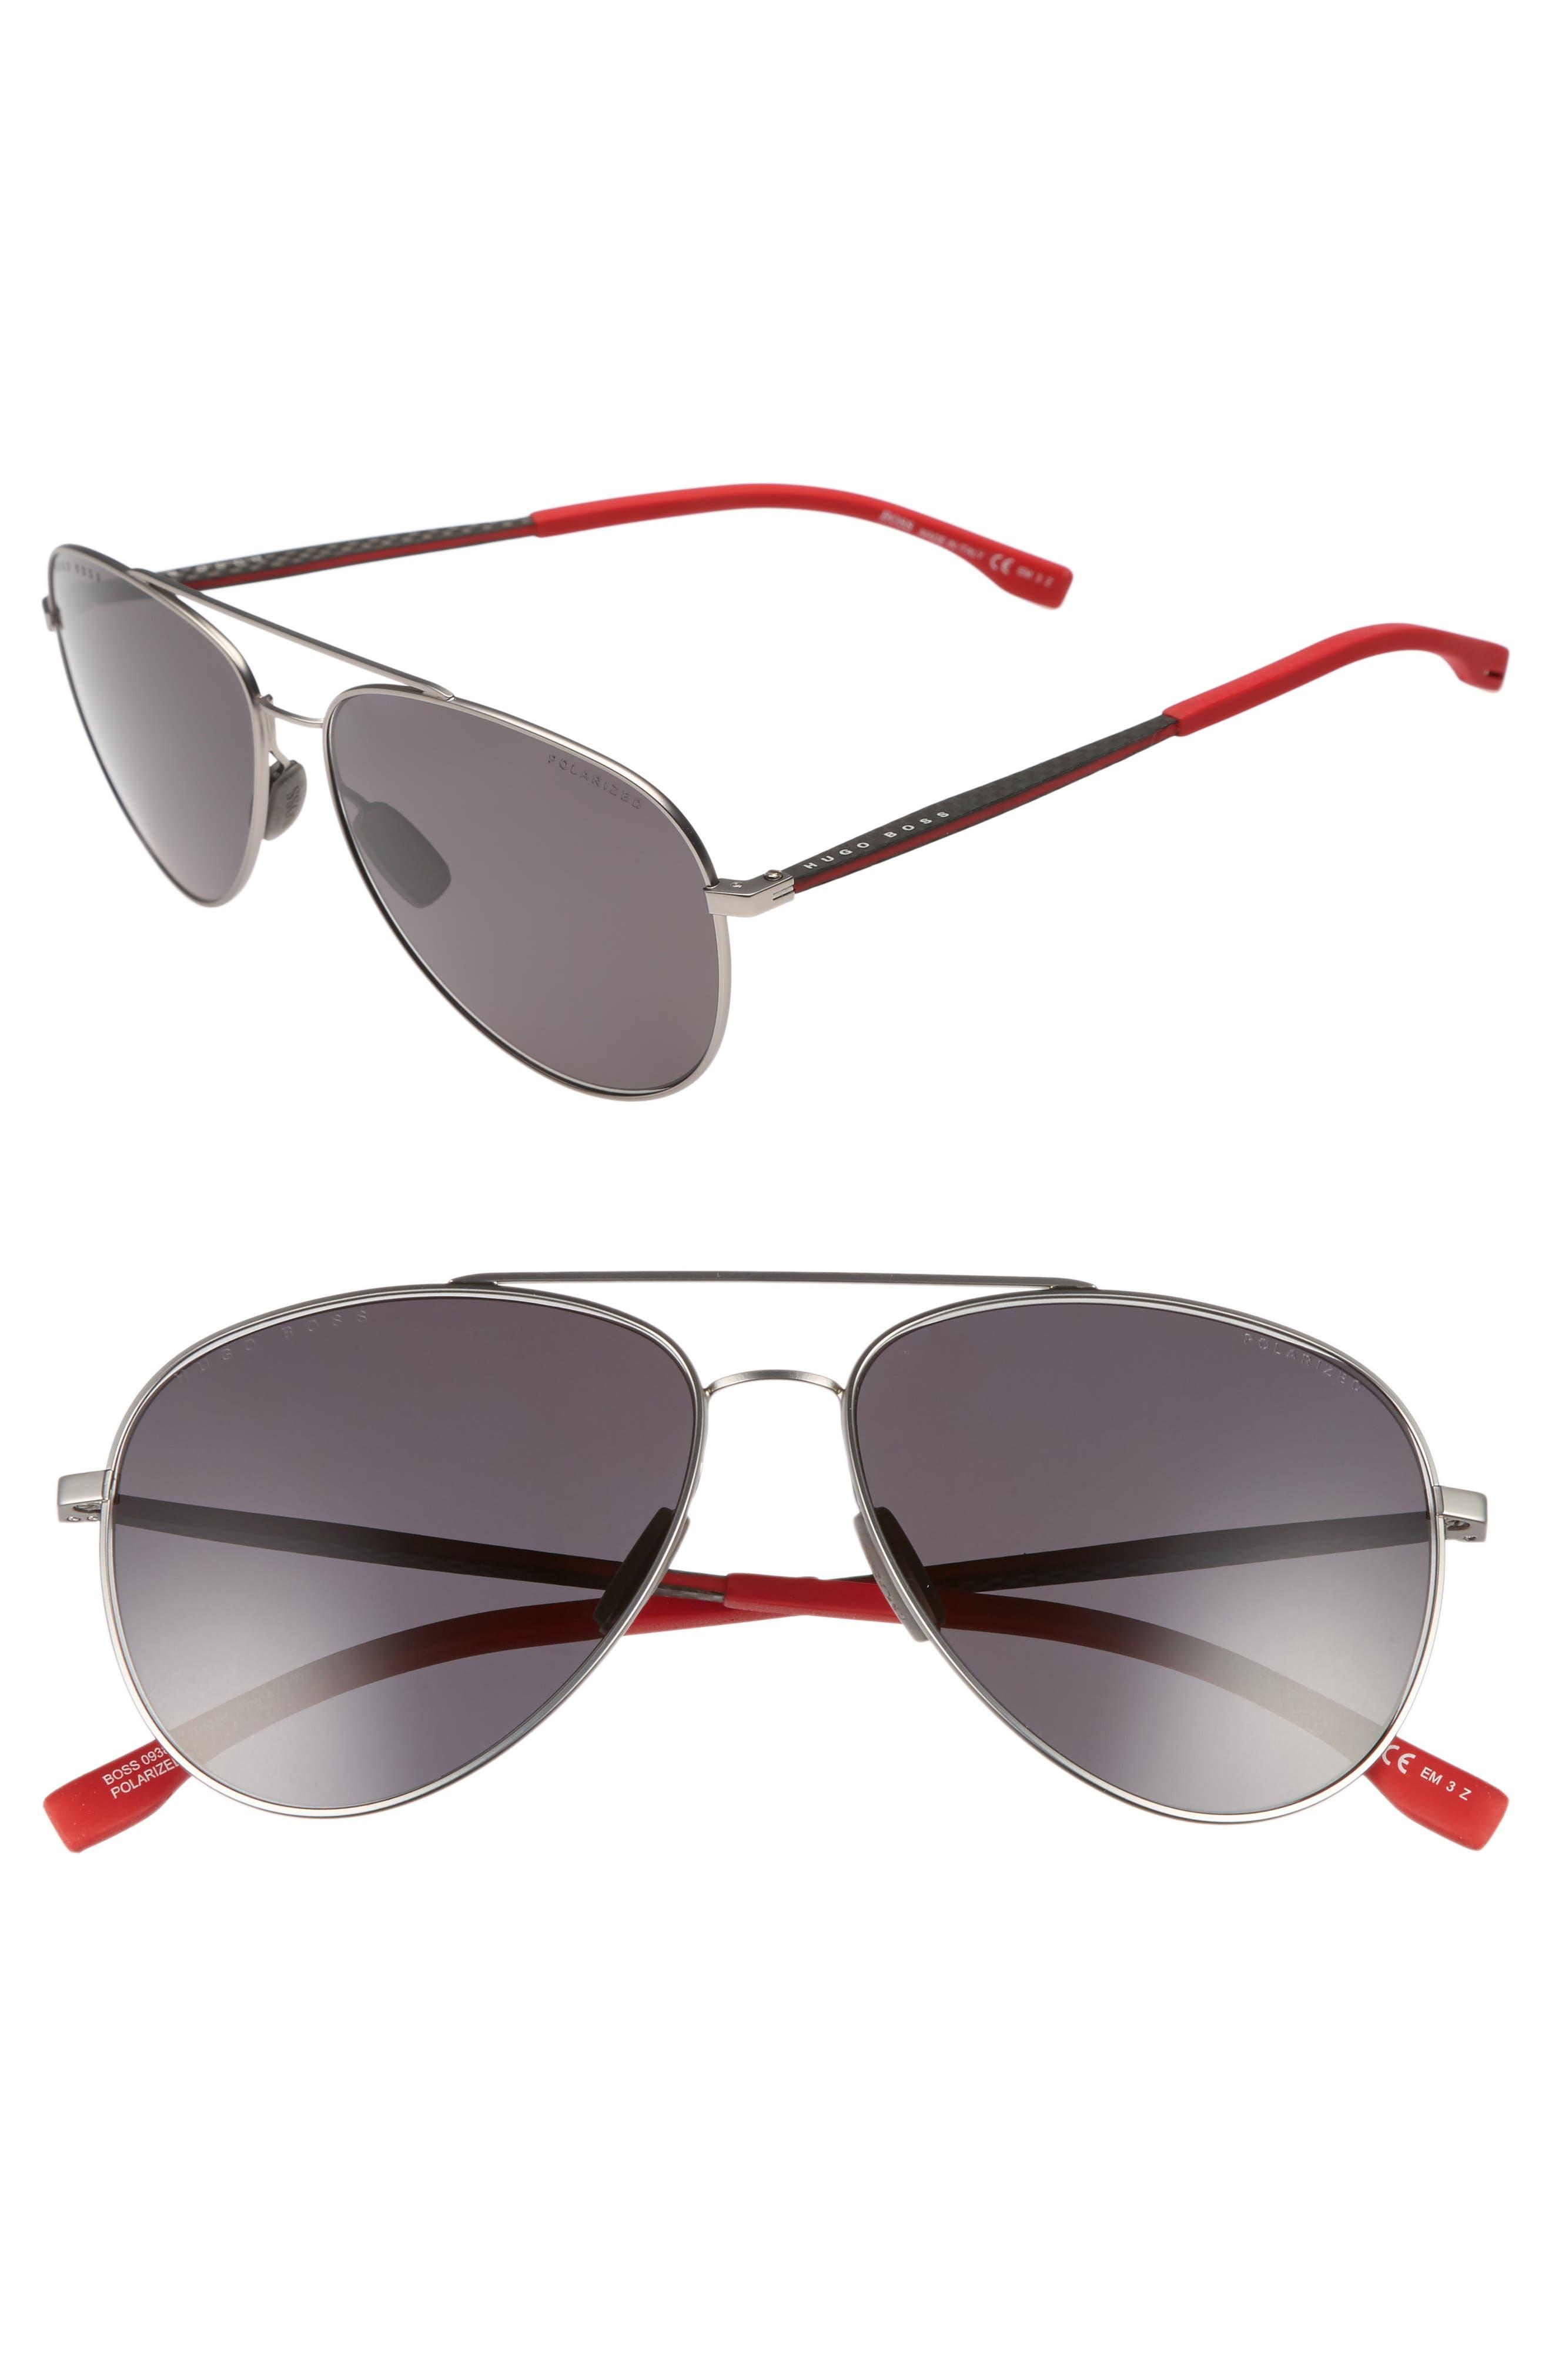 59mm Aviator Sunglasses,                         Main,                         color, GREY RUBBER/ GREY